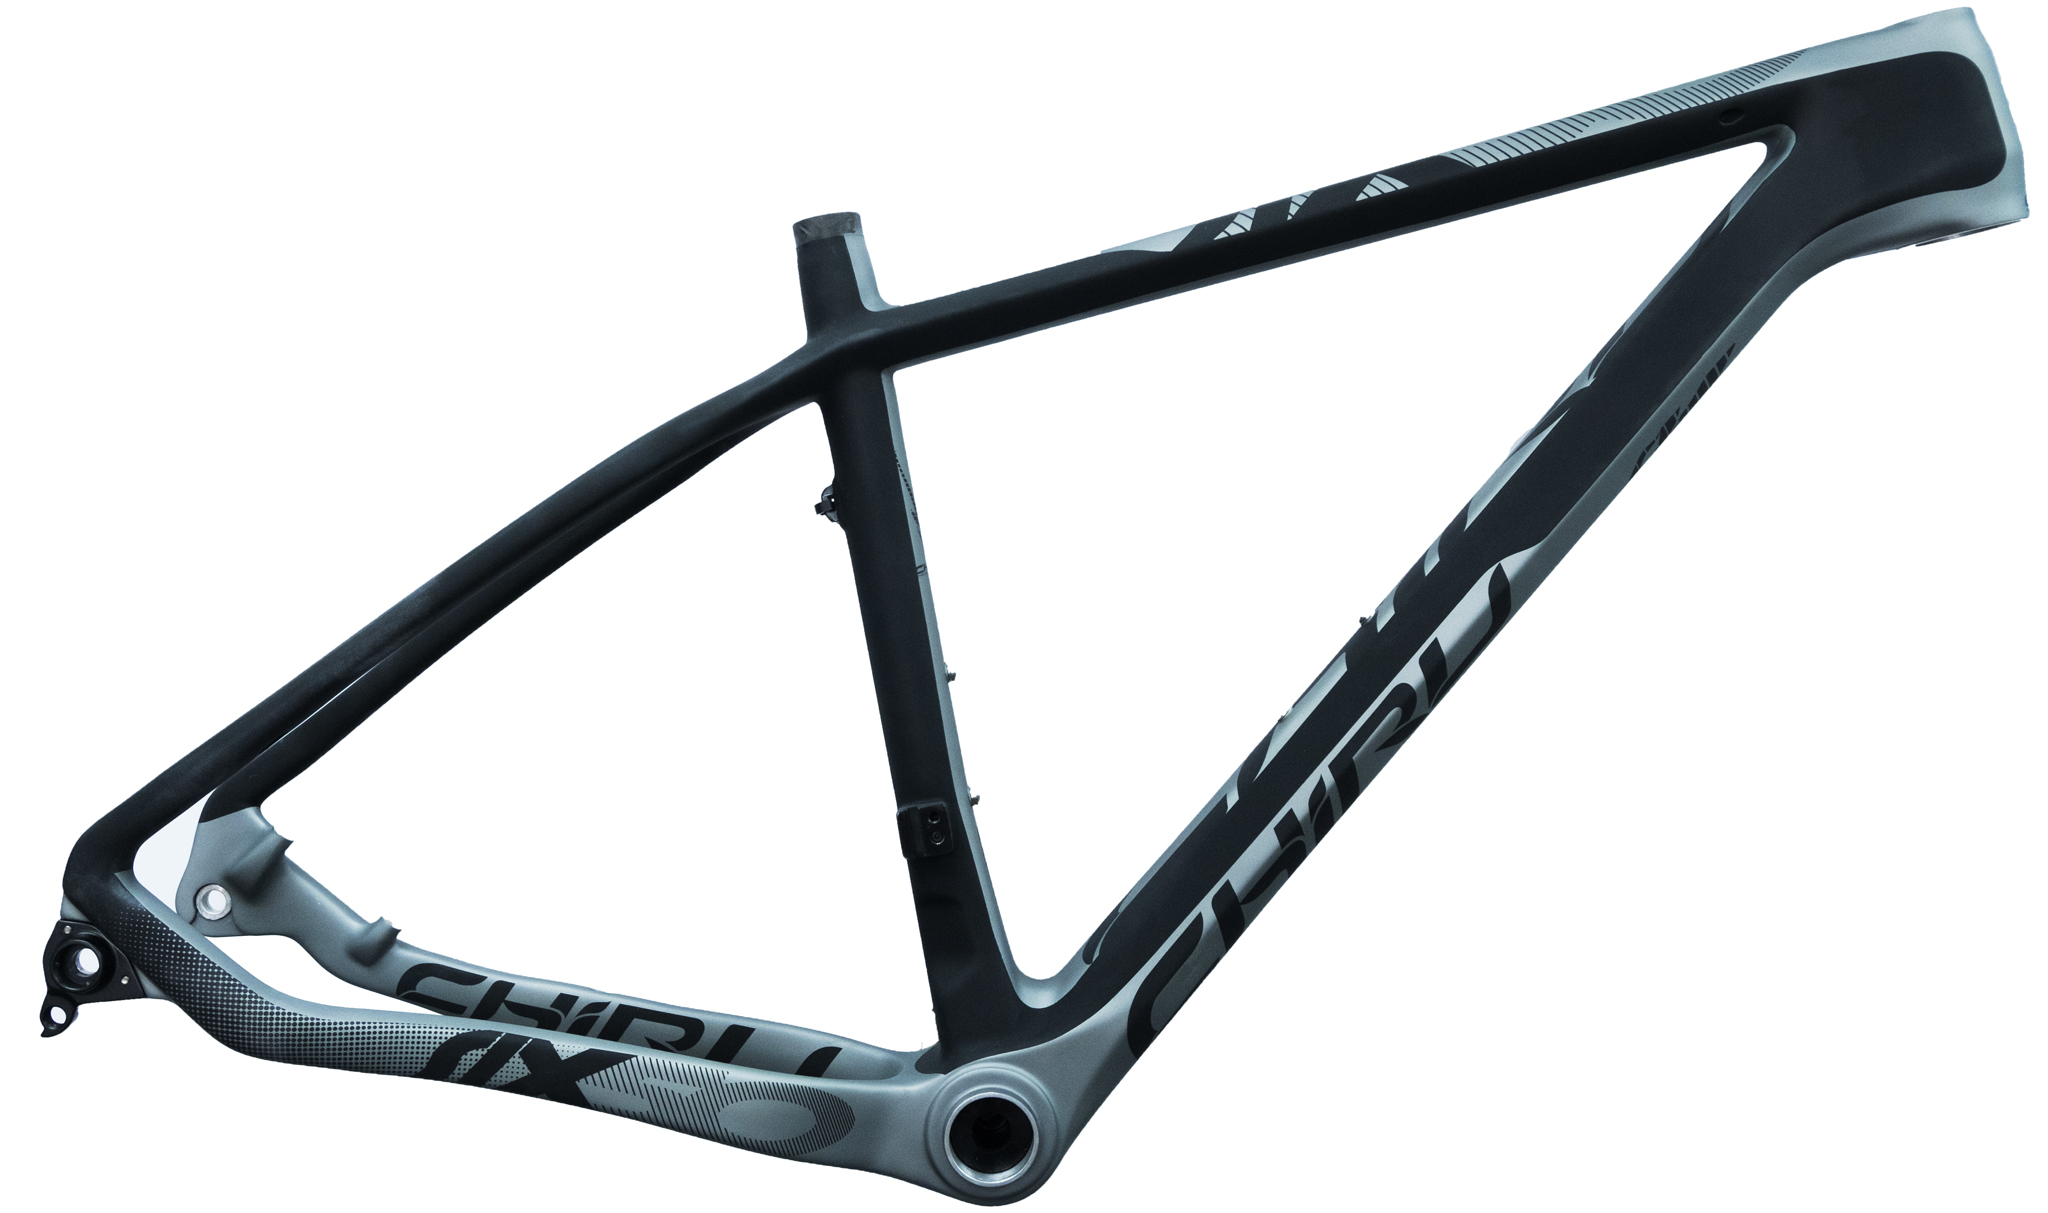 SIX50-Mountain-Bike-Bicycle-Cycle-Carbon-Endurance-Frame-Marathon-Power-Transfer-High-Performance-High-End-Adventure-Race-XTERRA-X-Terra.jpg